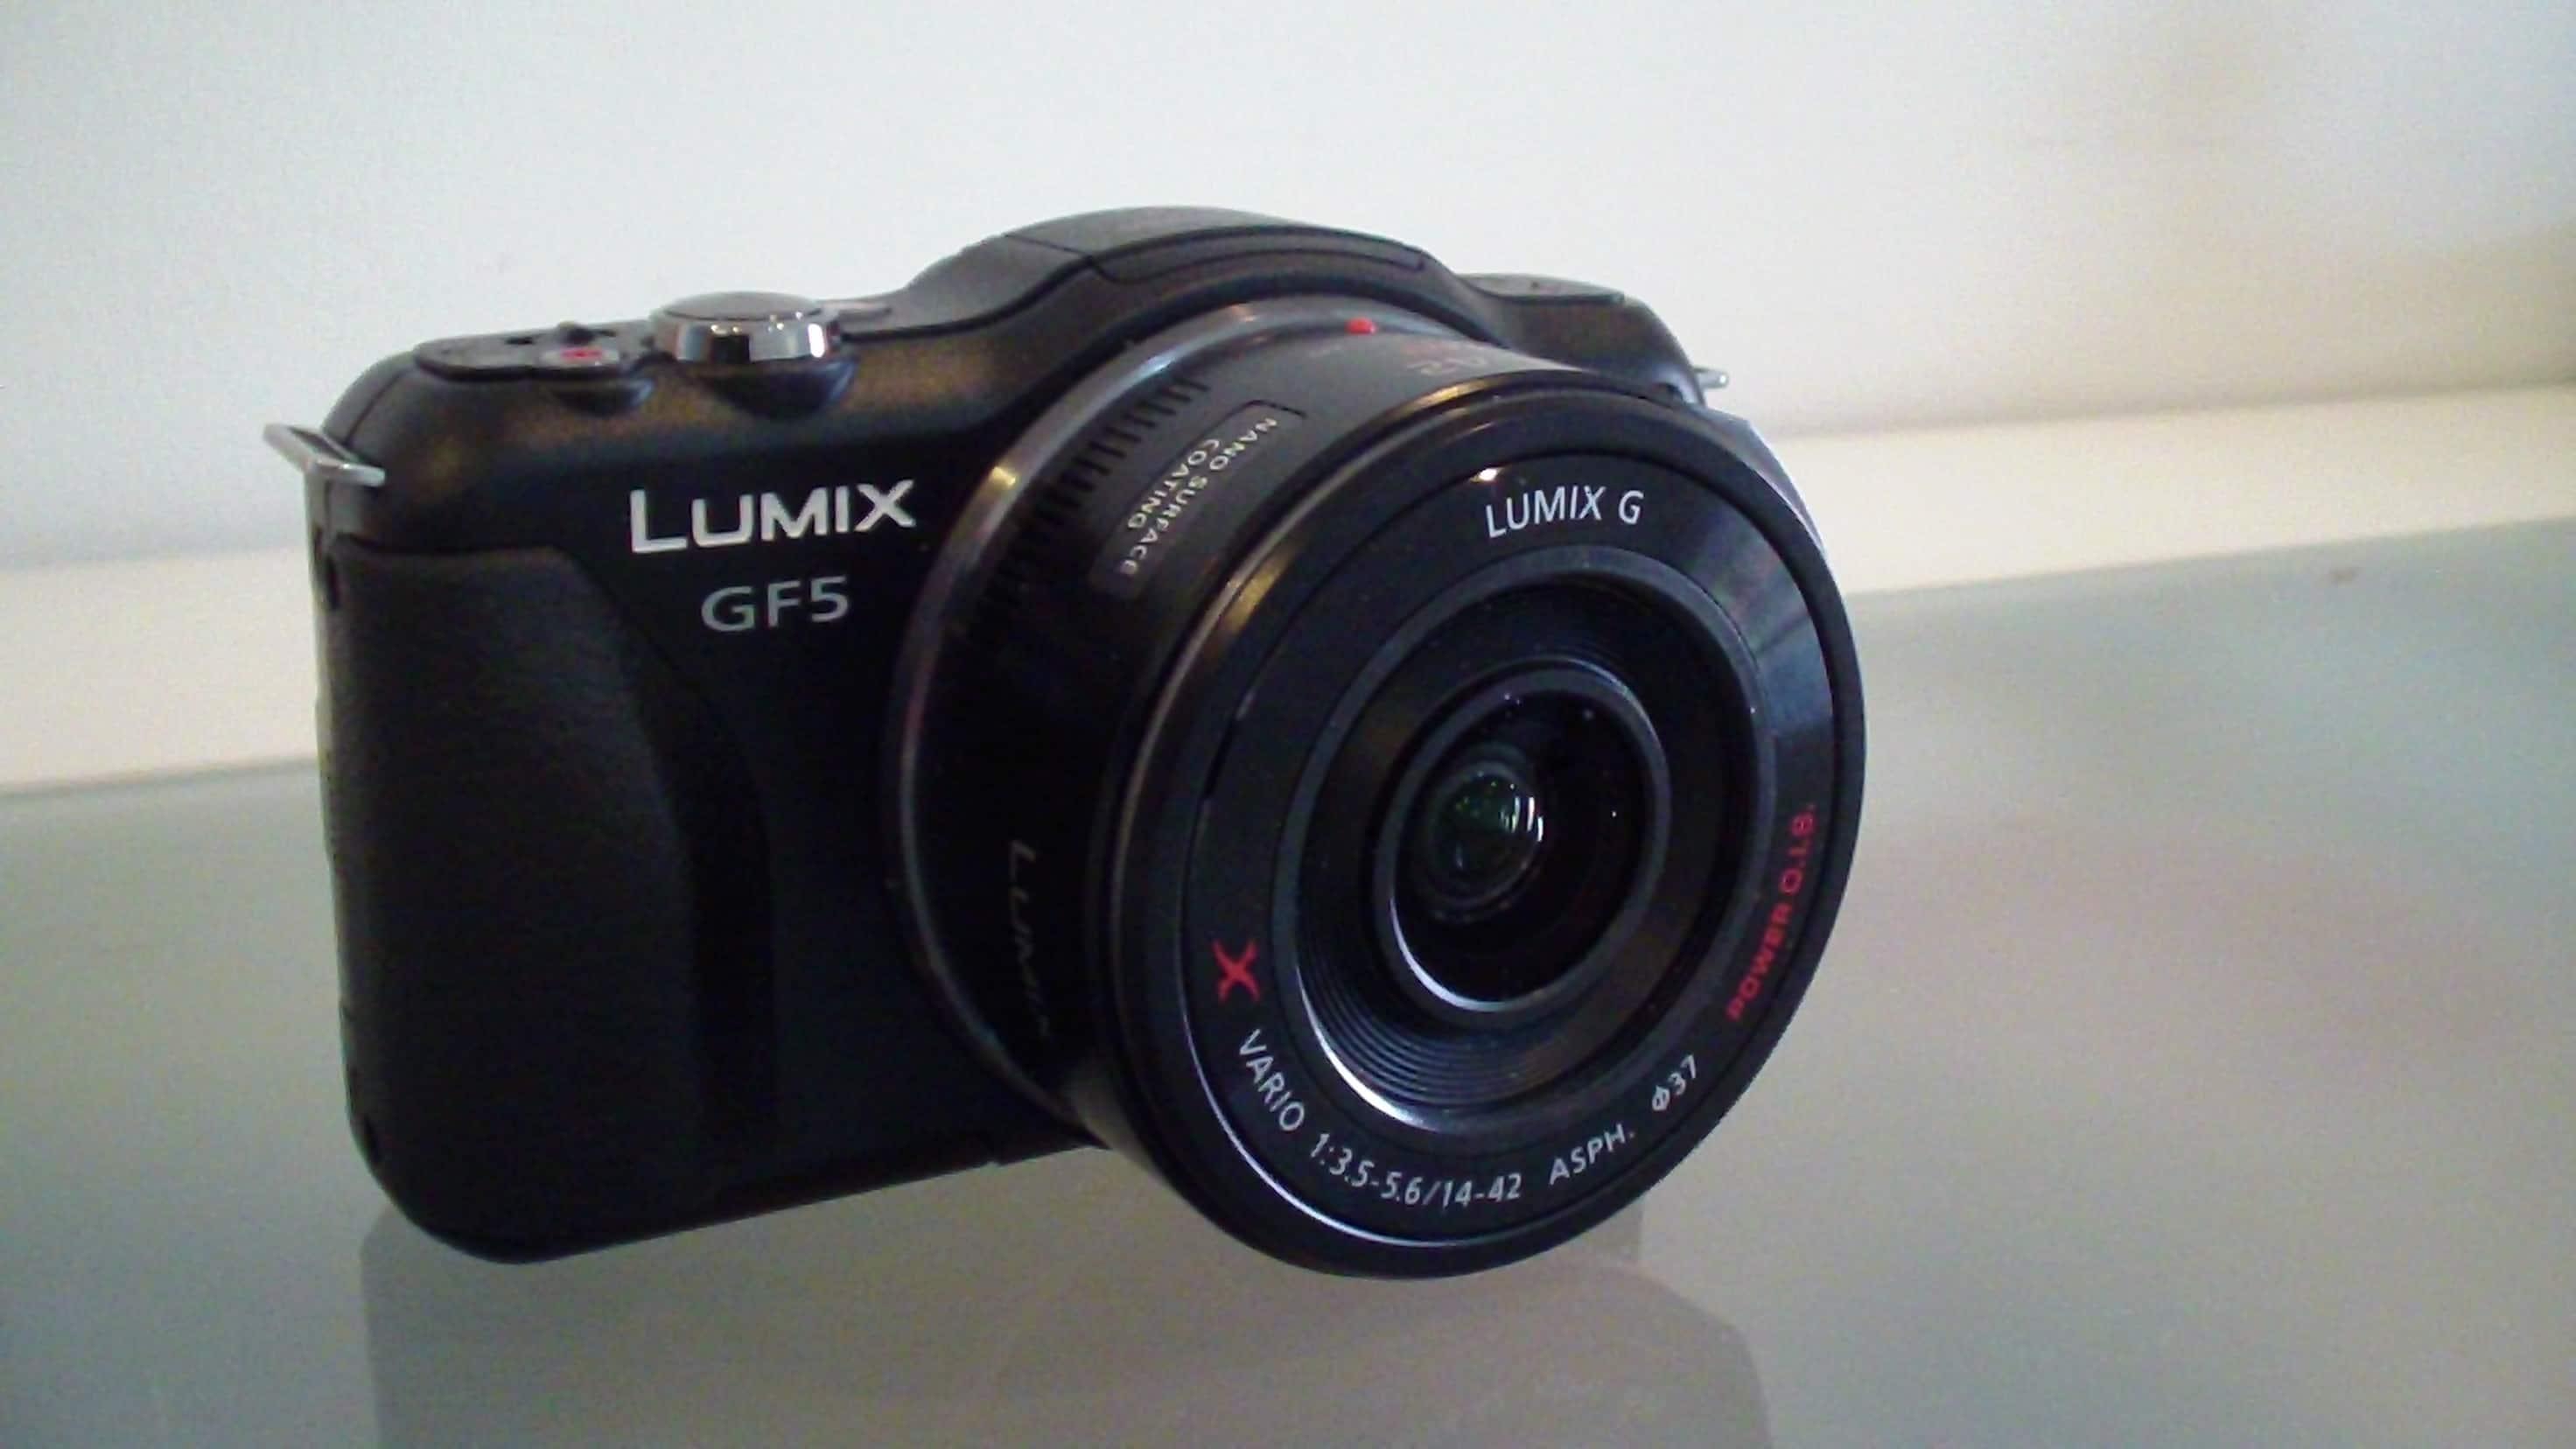 Panasonic Lumix GF5 Camera